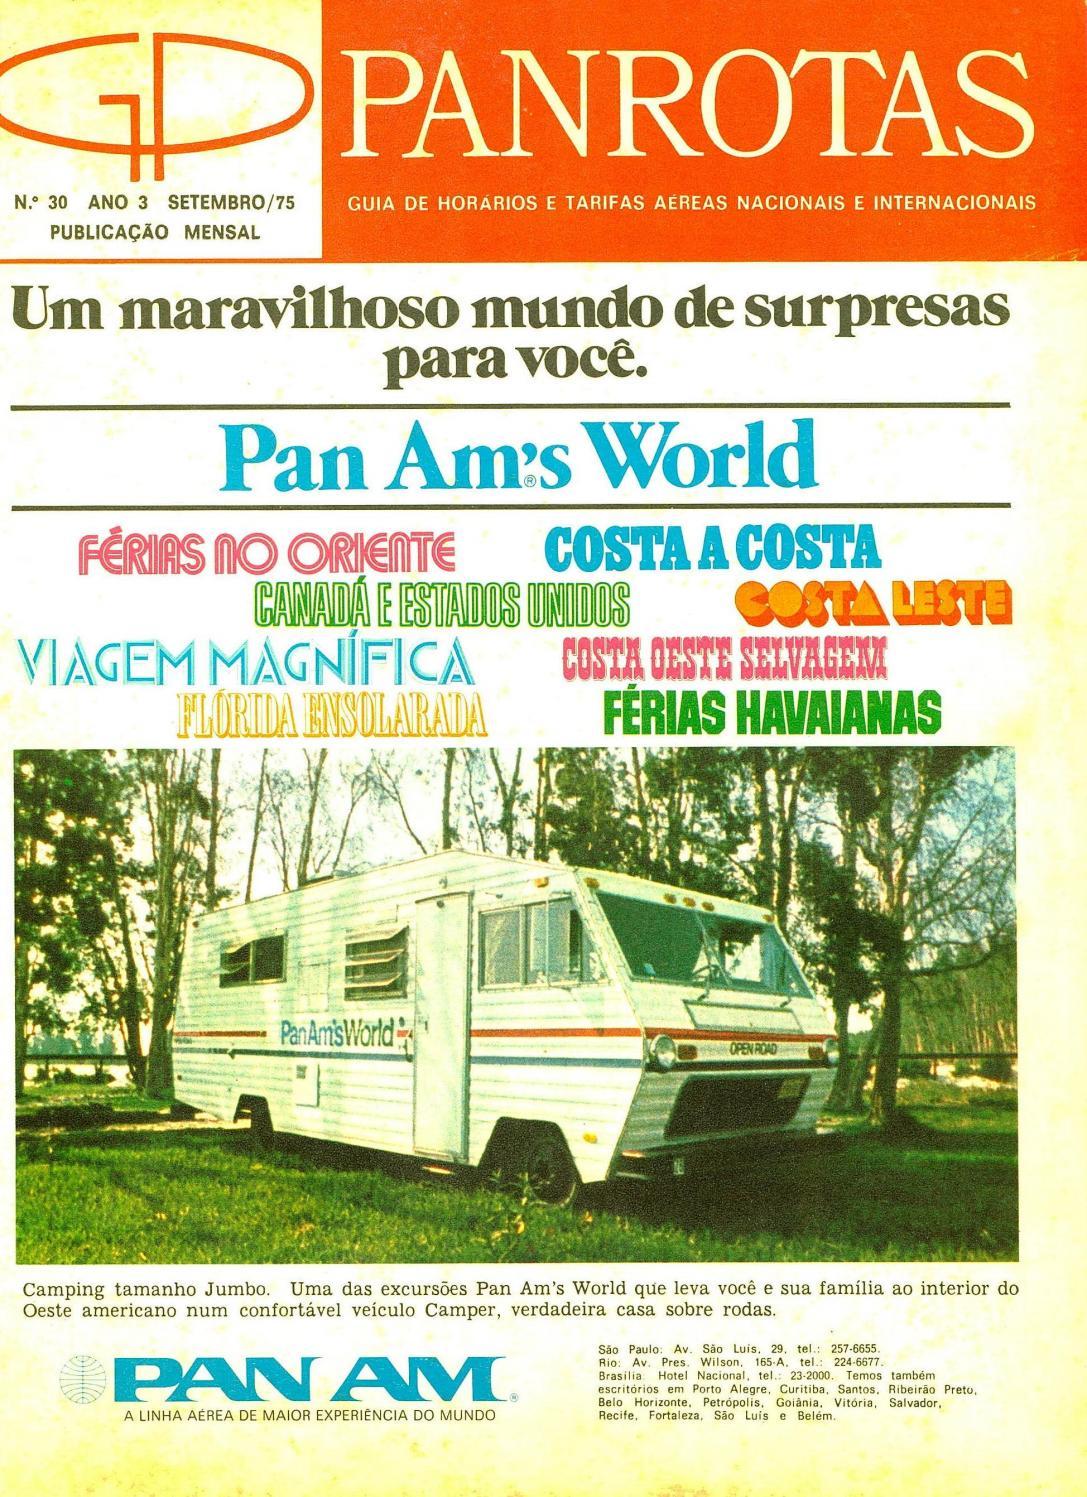 e22bfabb0d Guia PANROTAS - Edição 30 - Setembro 1975 by PANROTAS Editora - issuu